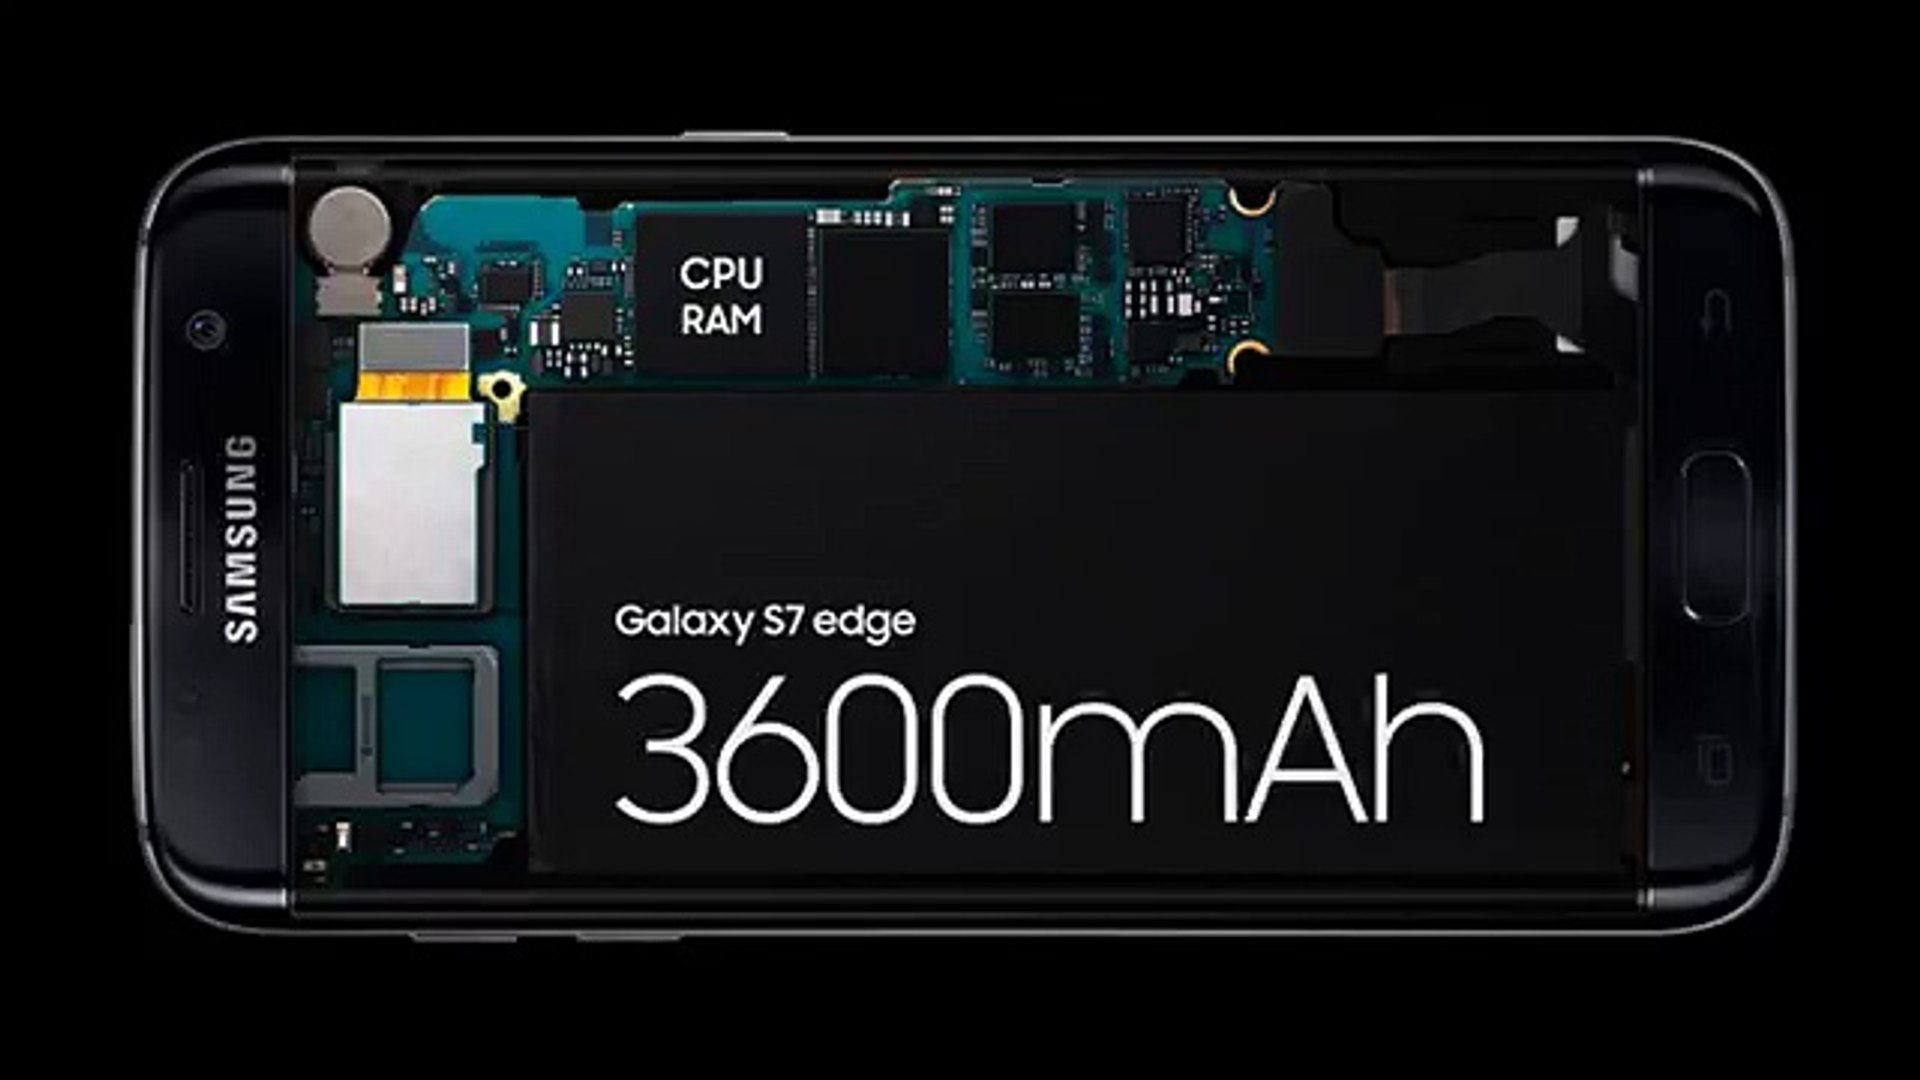 Samsung Galaxy S7 Exynos 8890 vs  Snapdragon 820 speed test